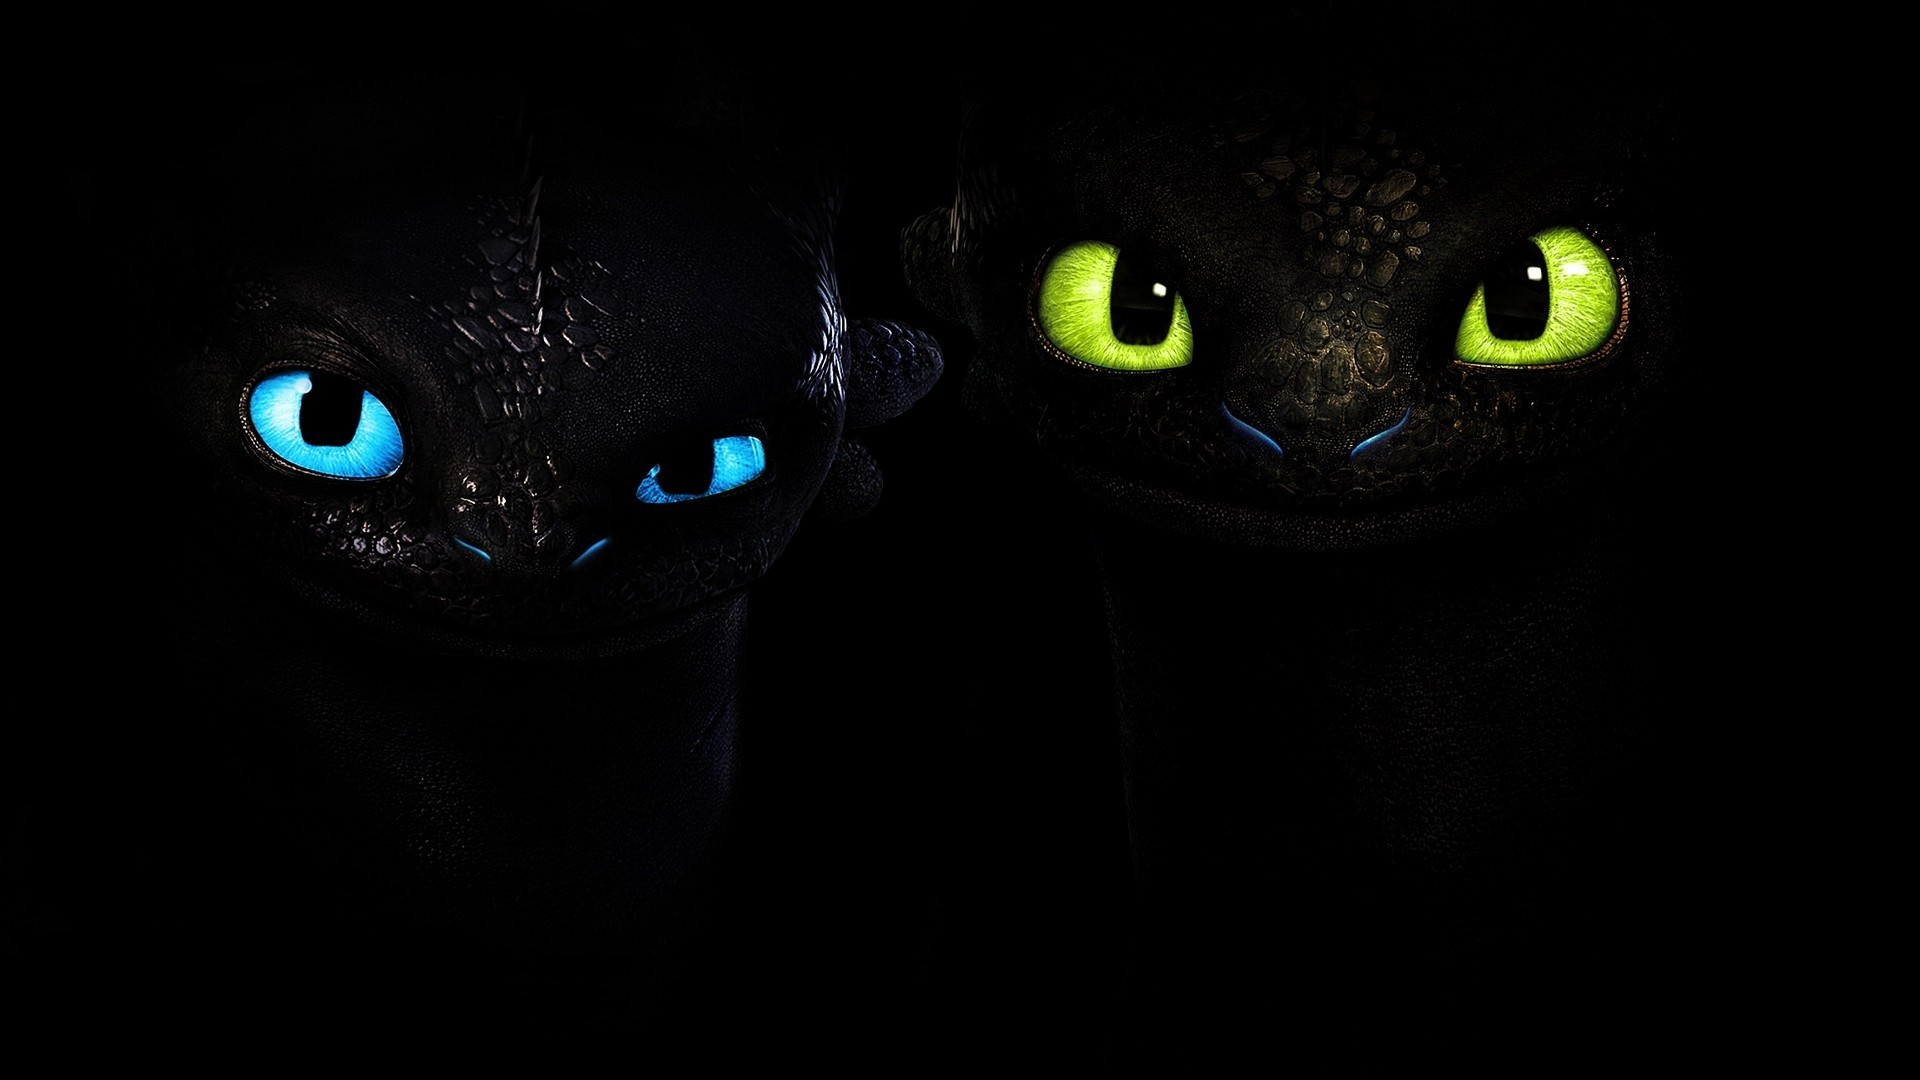 Filename: Fantasy_Two_baby_black_dragon_098415_.jpg